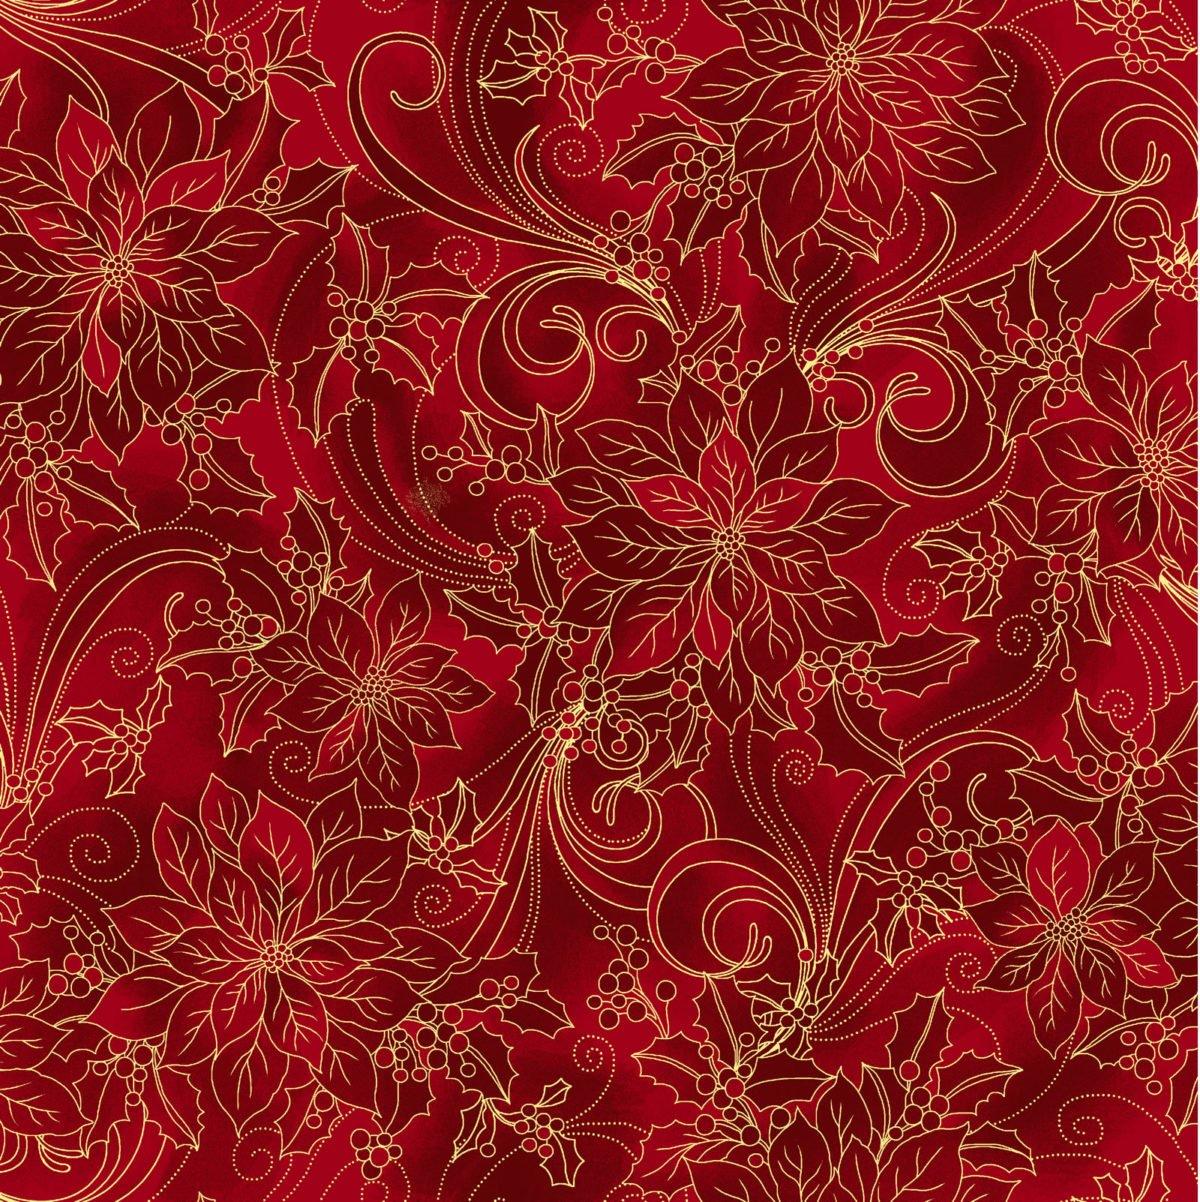 Noel Holly Red Poinsettia